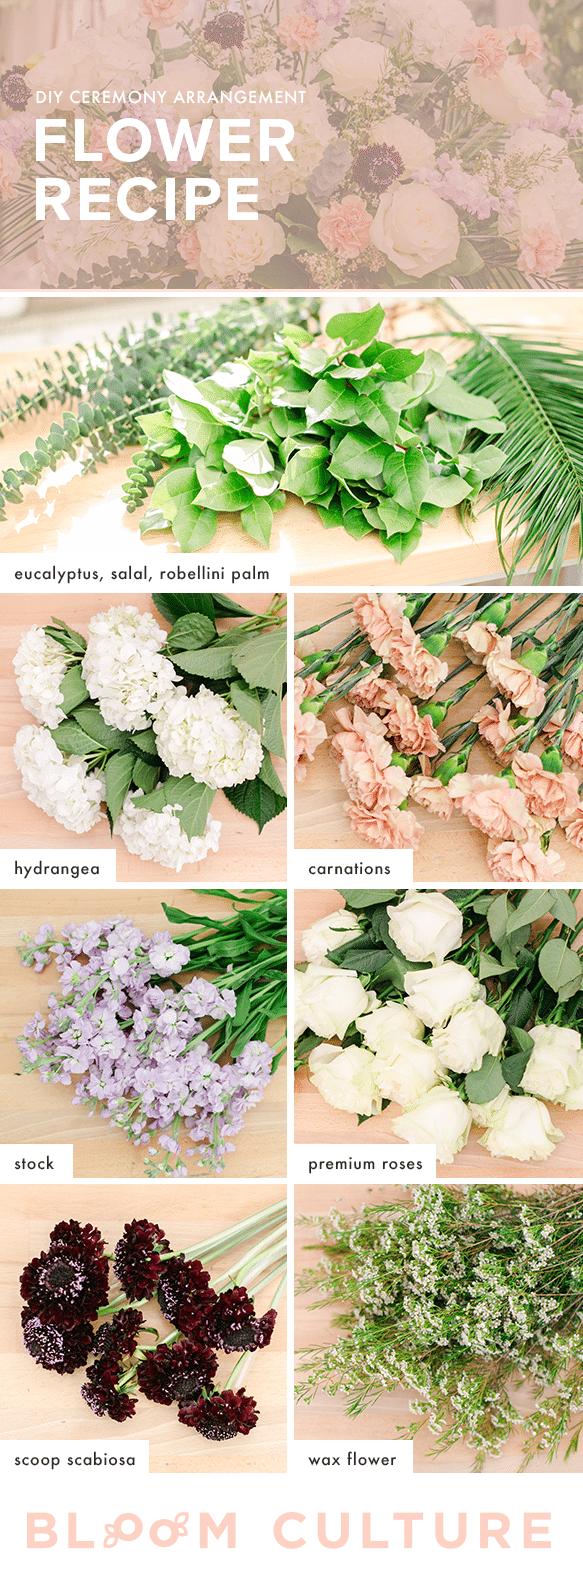 diy ceremony arrangement flower recipe